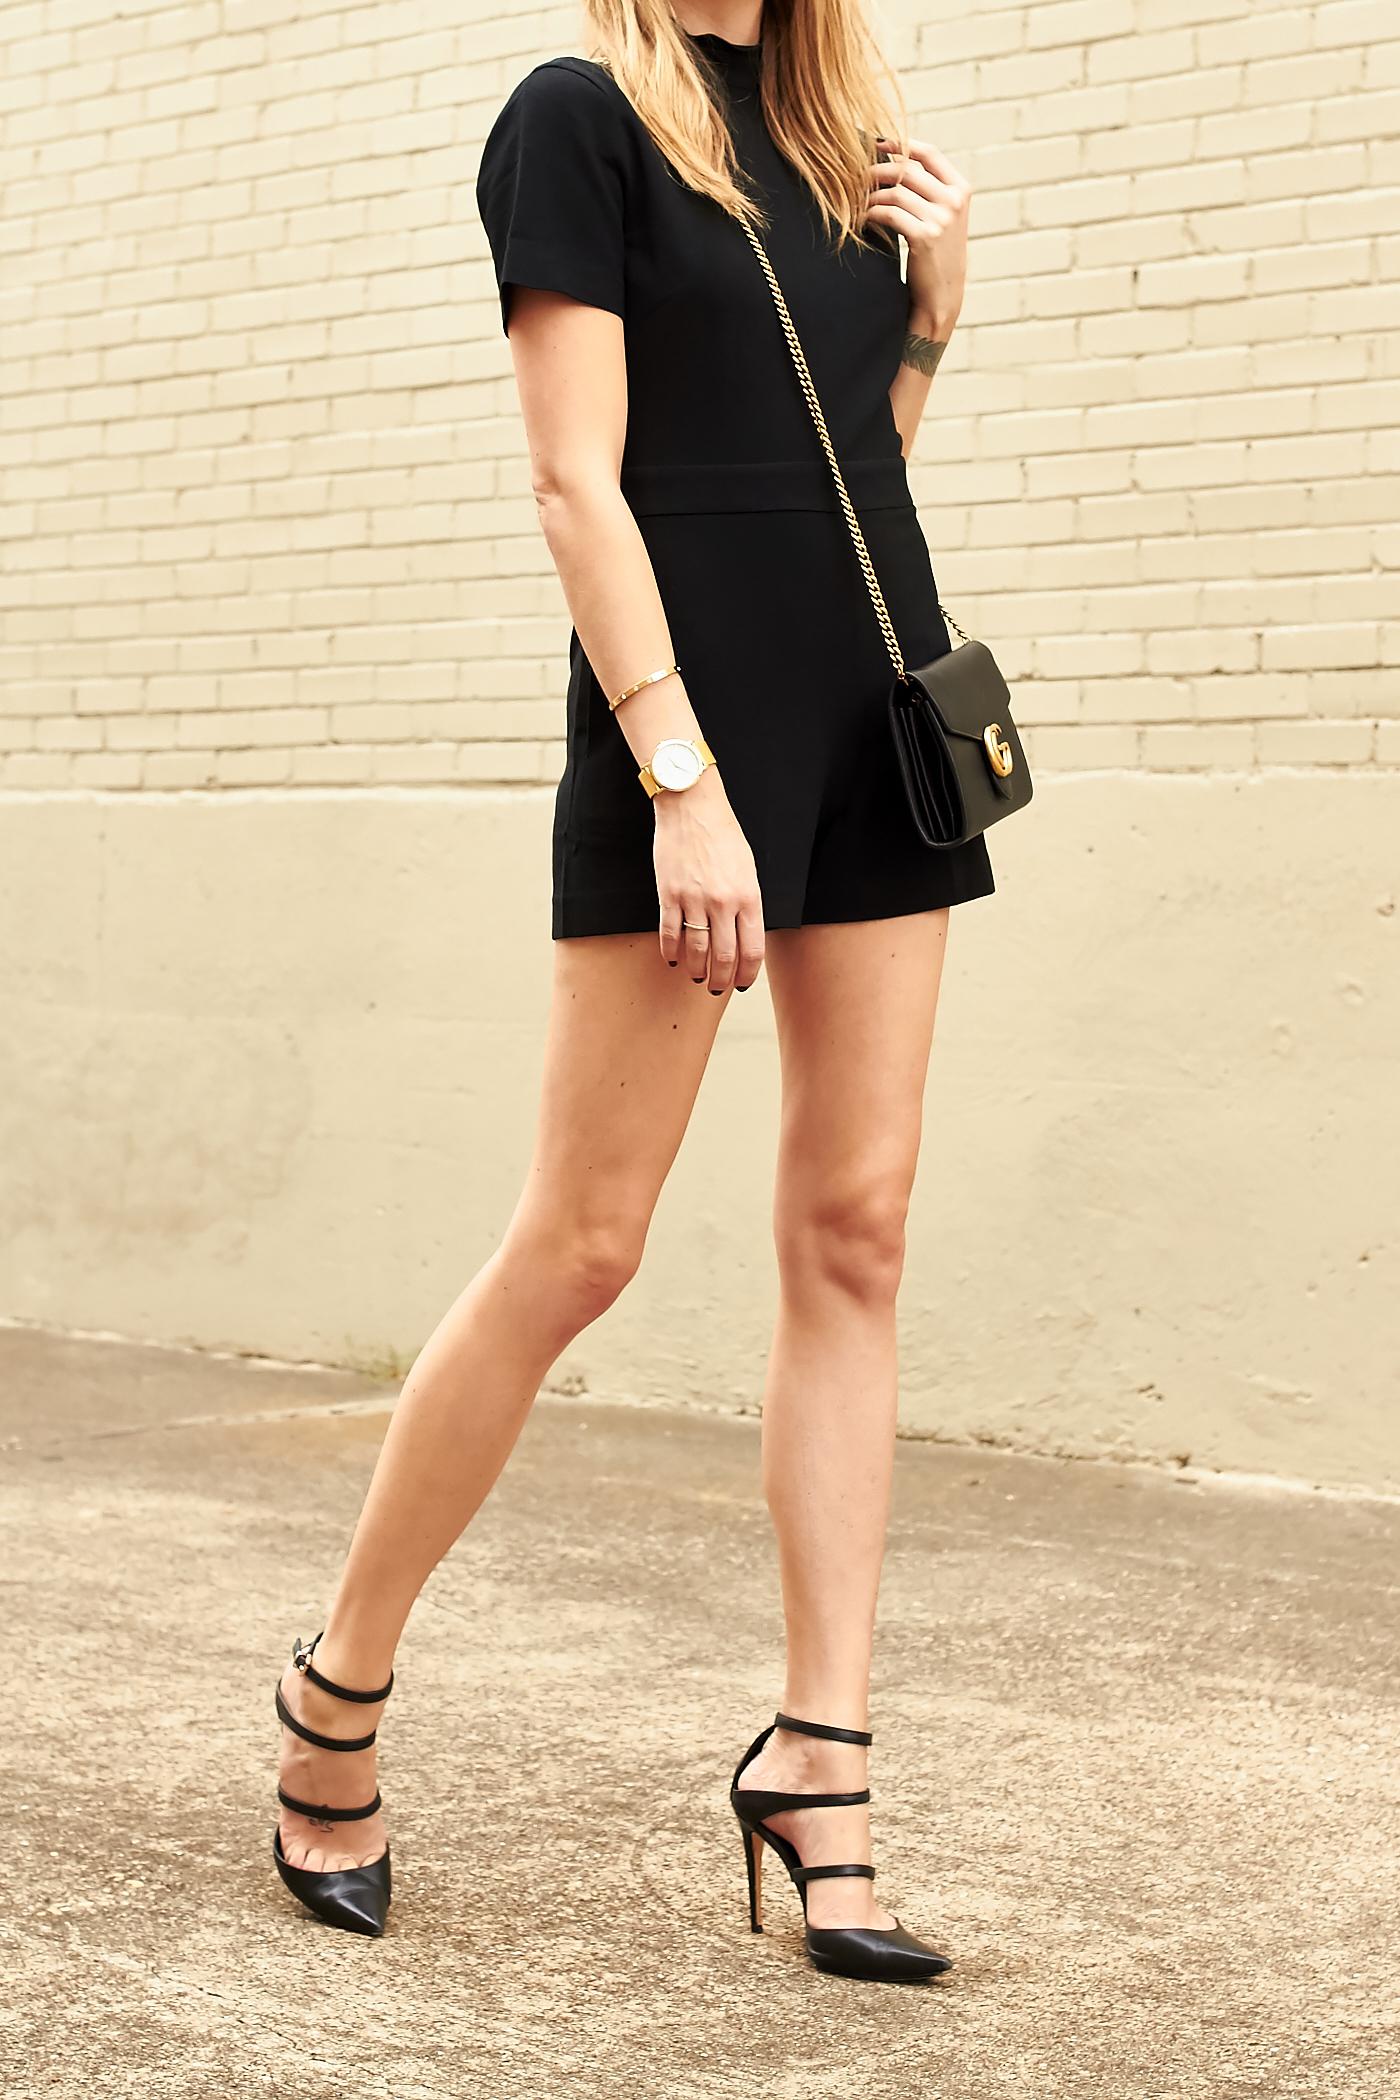 fashion-jackson-club-monaco-black-philena-romper-black-strappy-heels